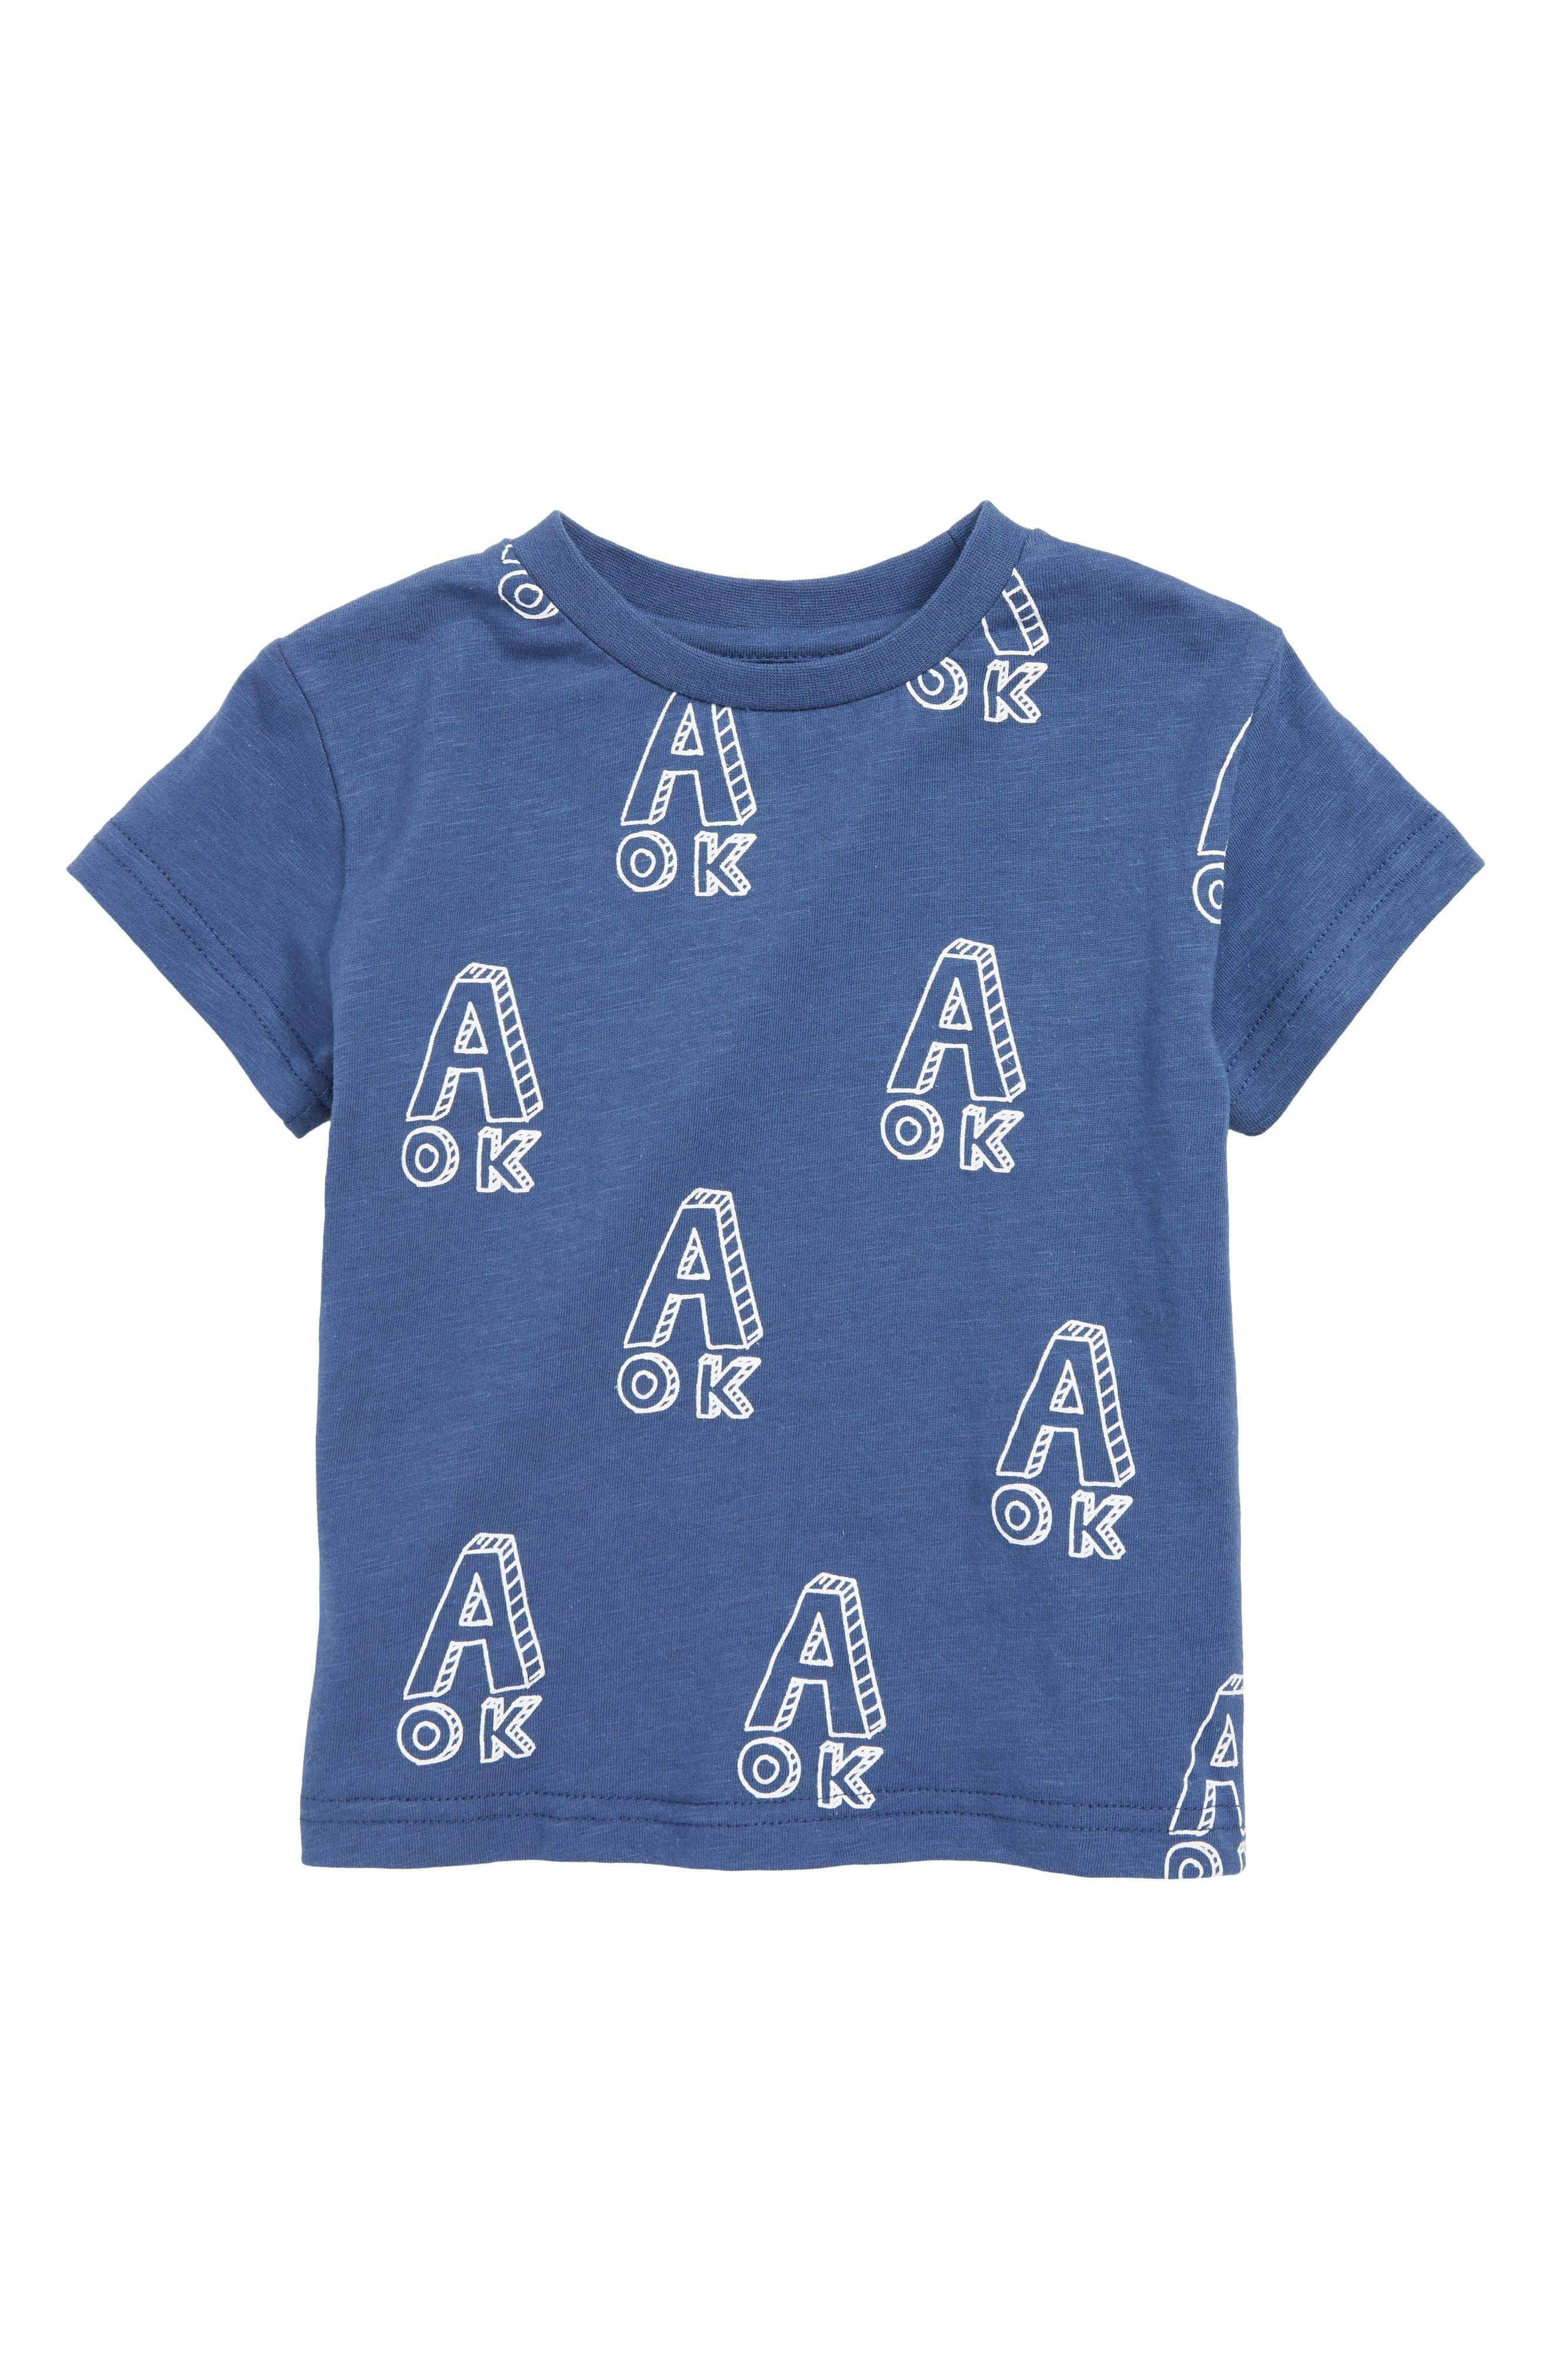 TINY TRIBE, A OK Print T-Shirt, Main thumbnail 1, color, NAVY